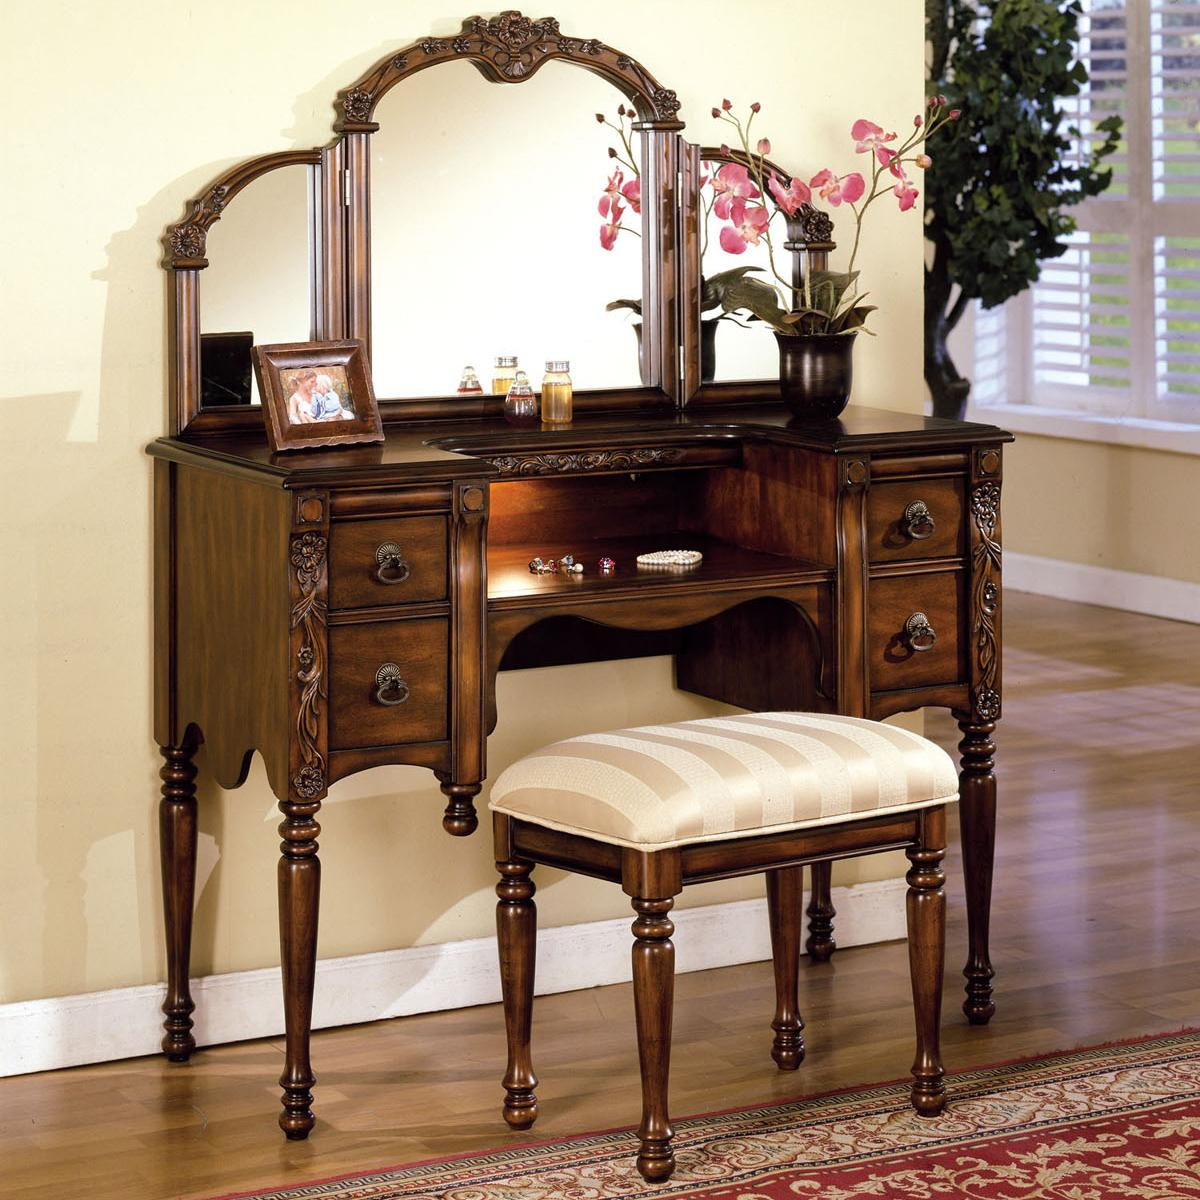 Ashton Vanity Group by Acme Furniture at Carolina Direct